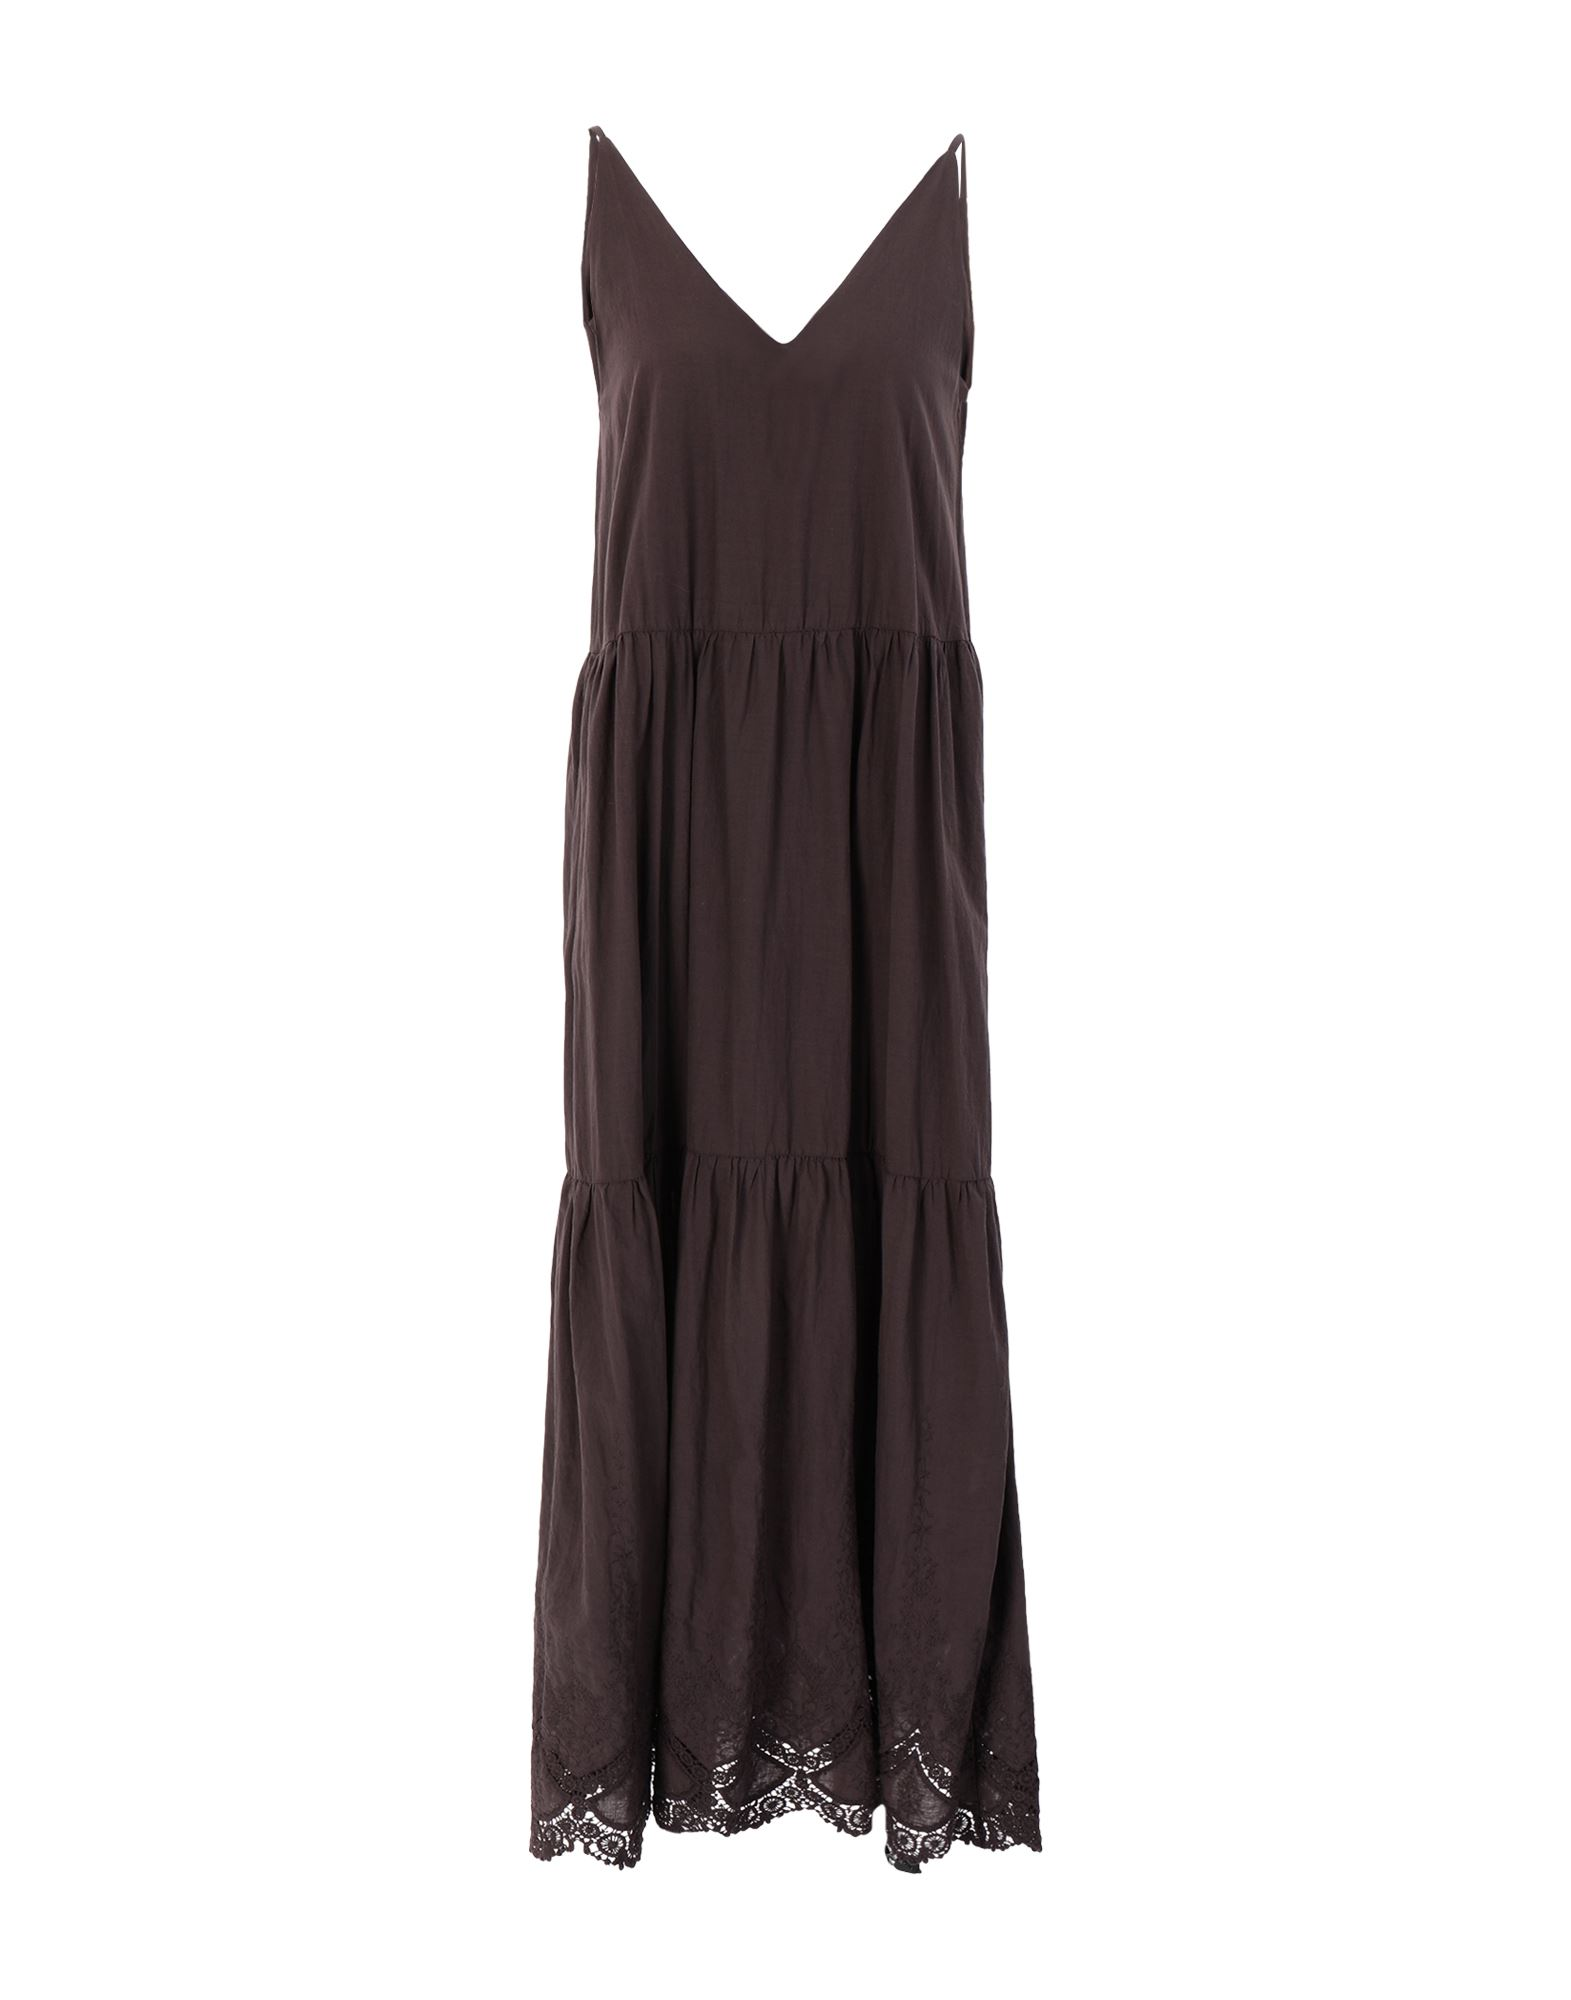 VICTORIA C. Long dresses - Item 15108244